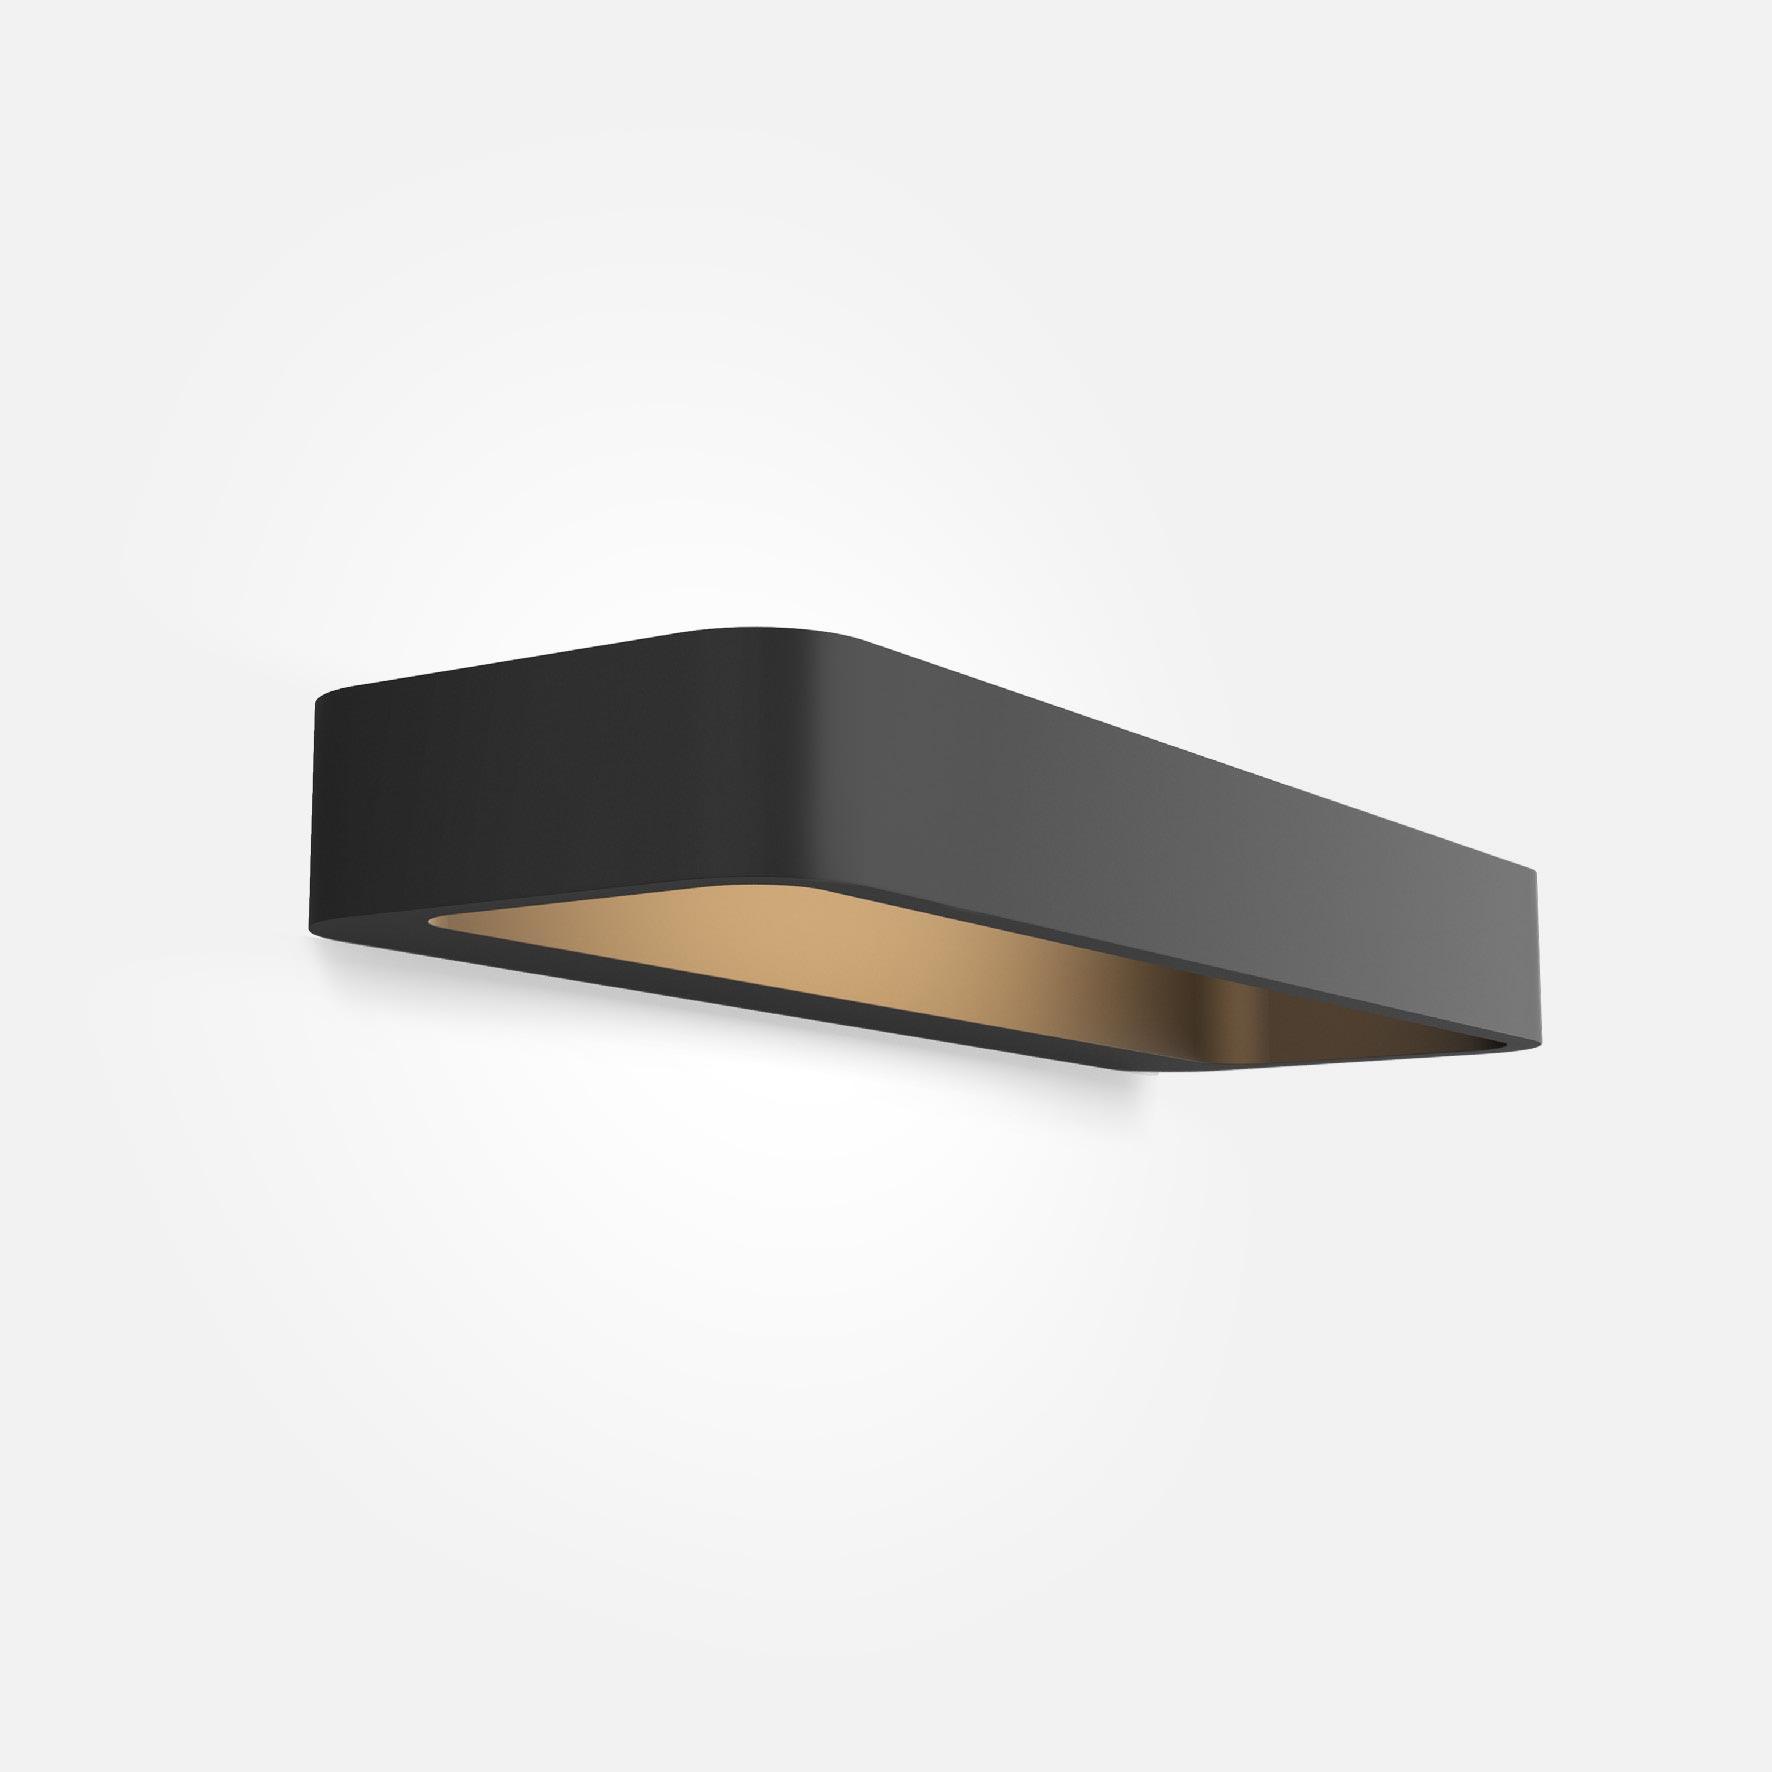 Benta 3.6 black texture